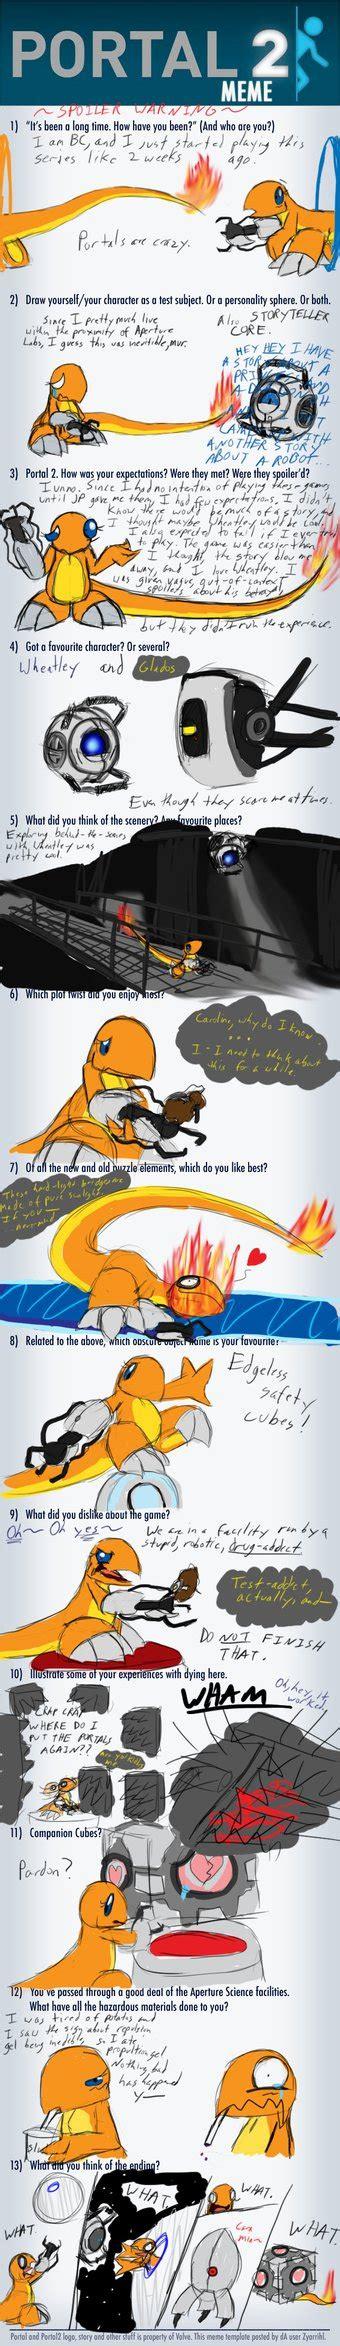 Portal 2 Meme By Blazingcoral On Deviantart